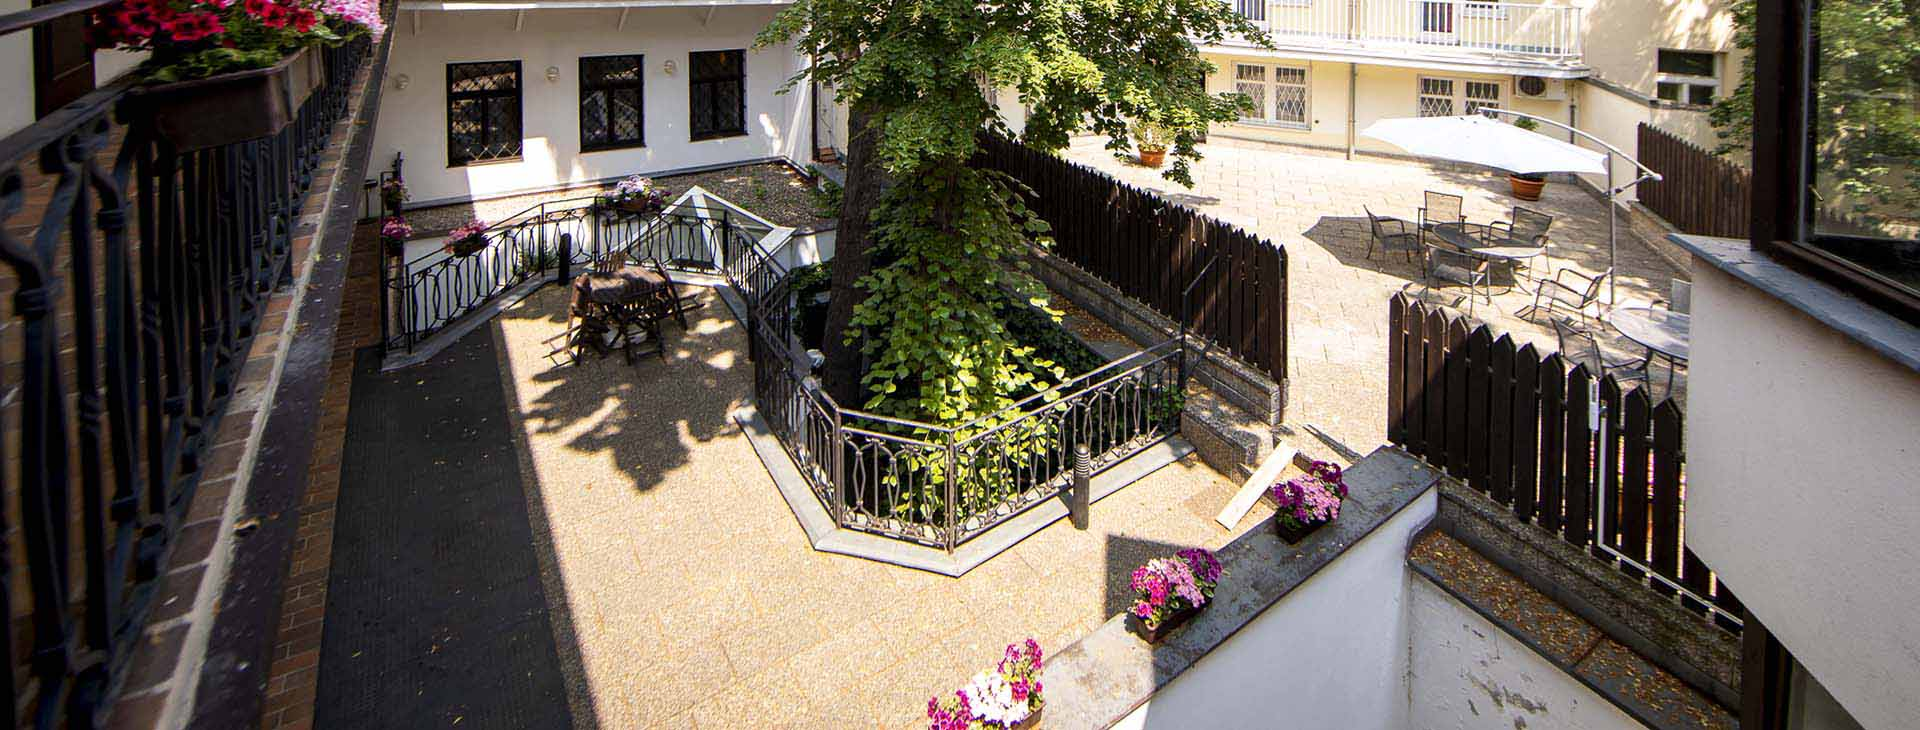 amadeus-hotel-prague-terrace-1920×730-1